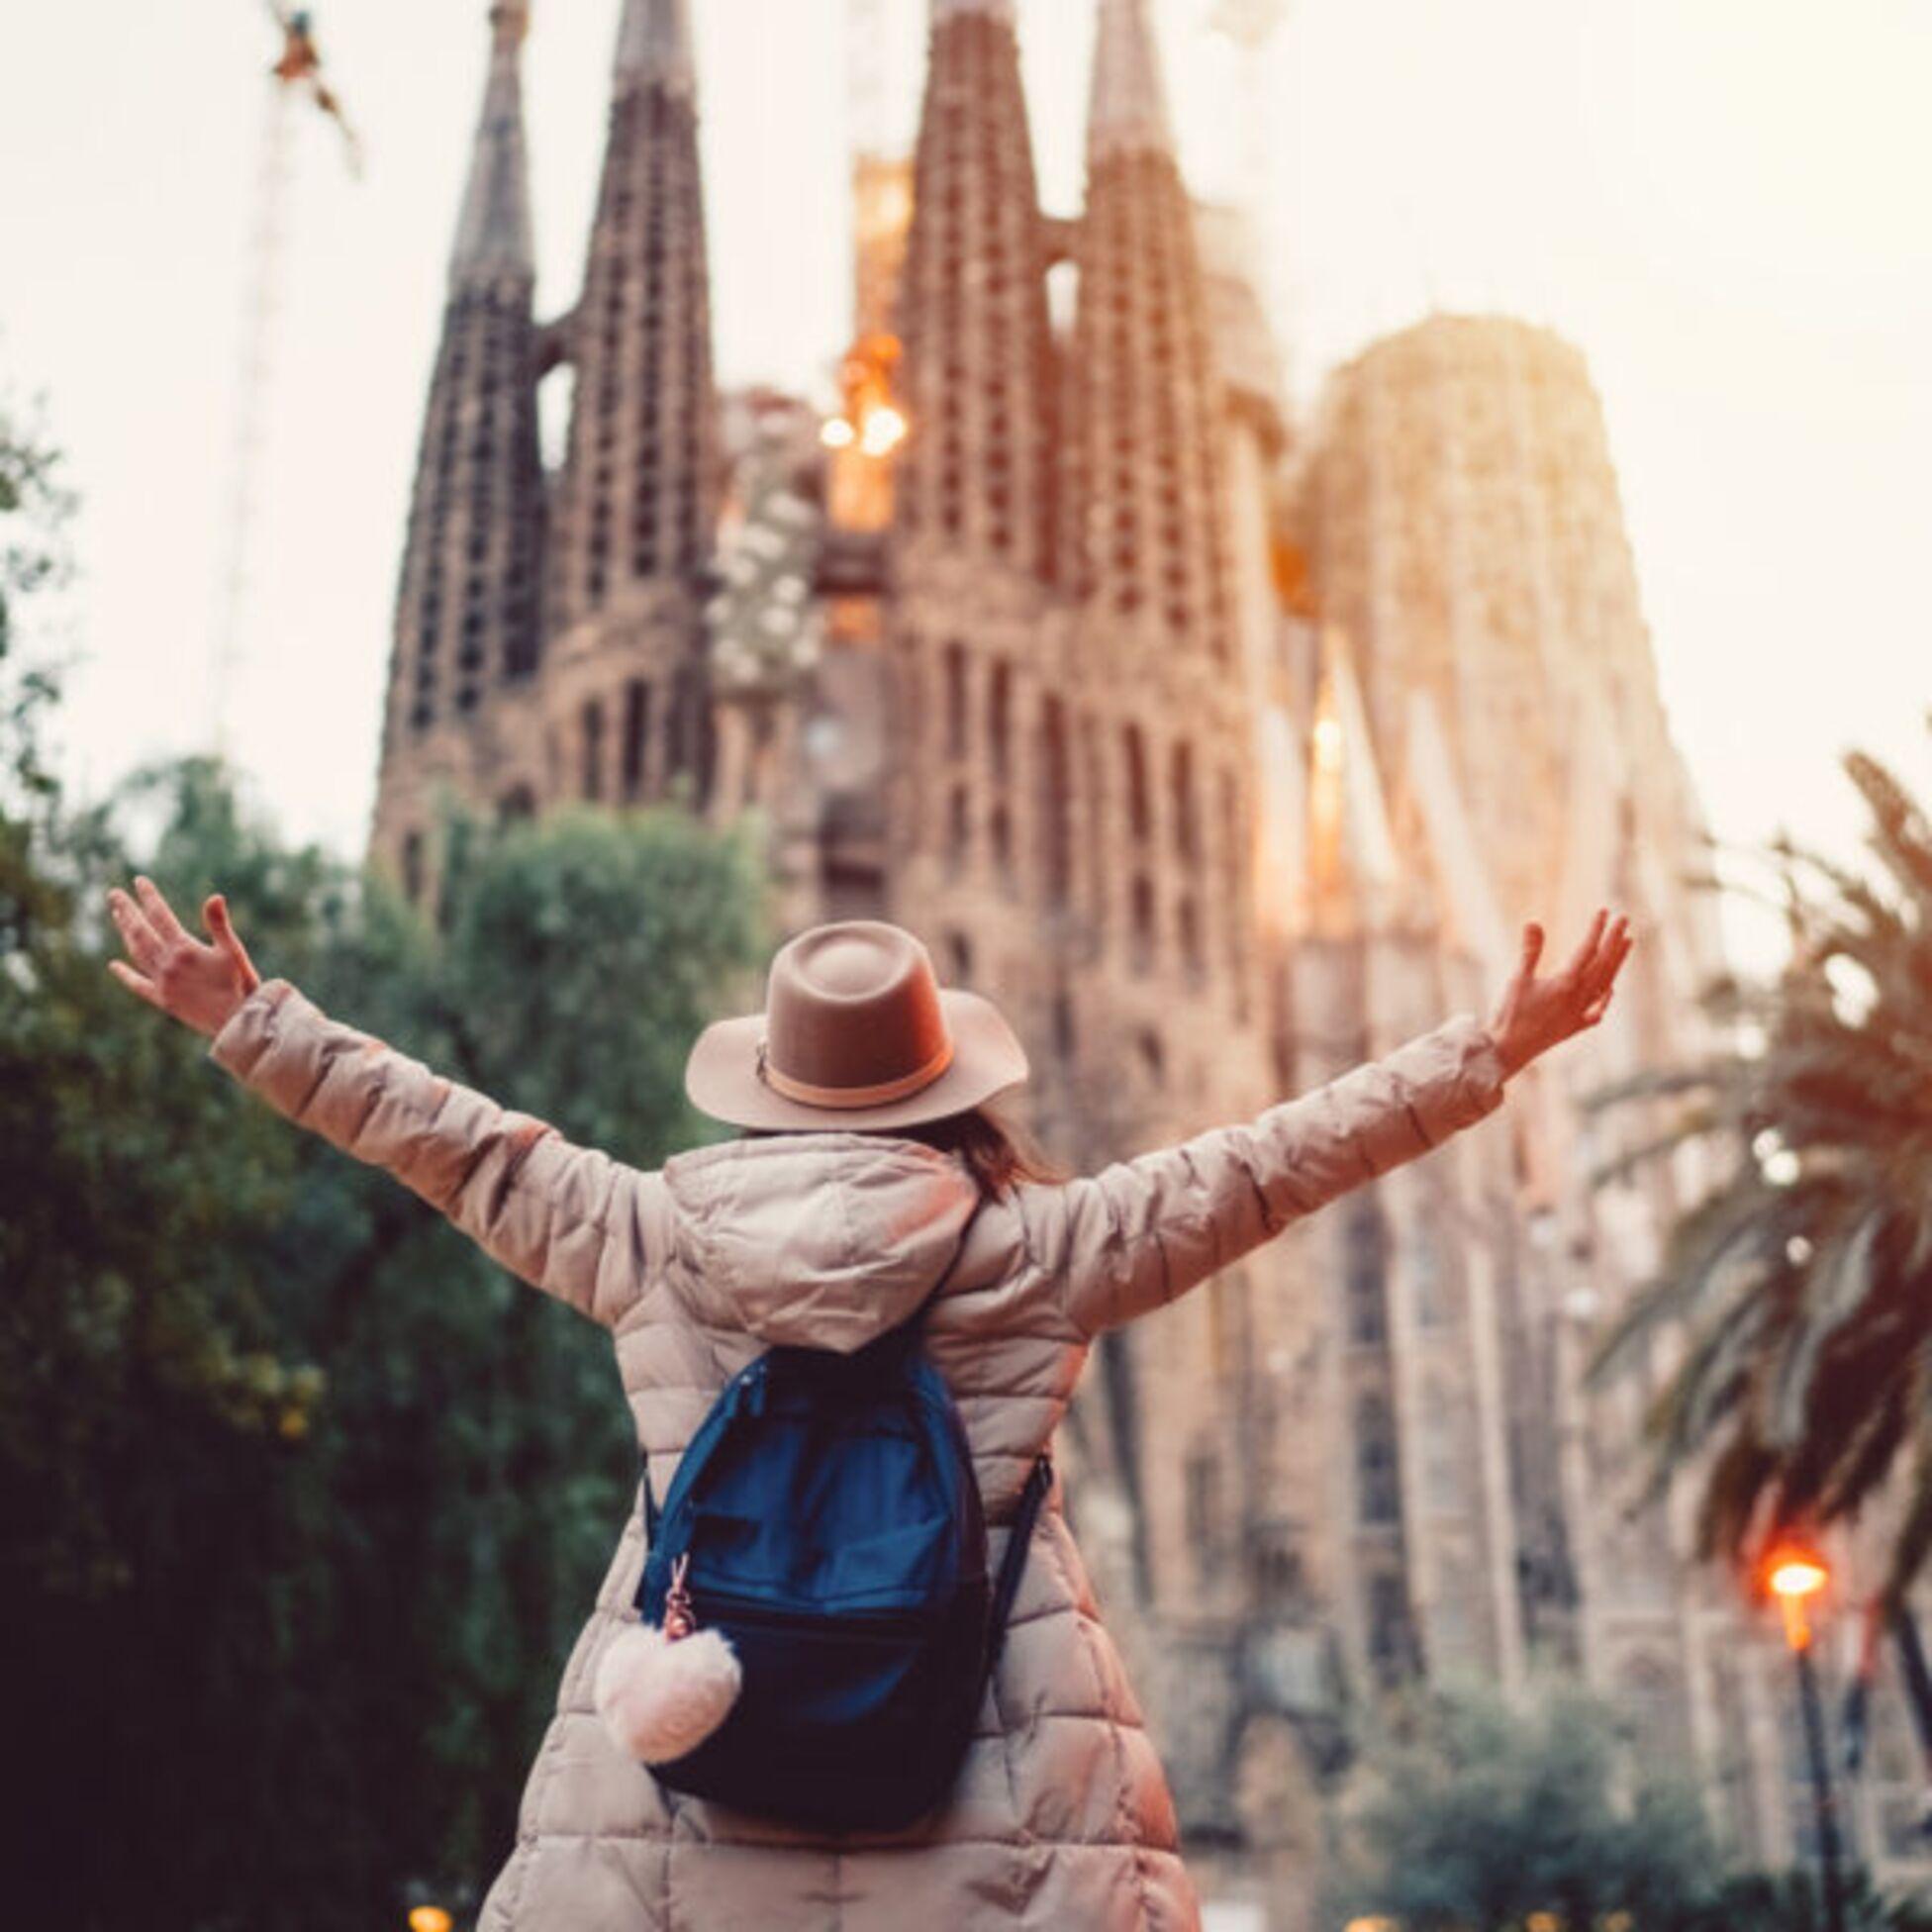 Junge Frau in Barcelona